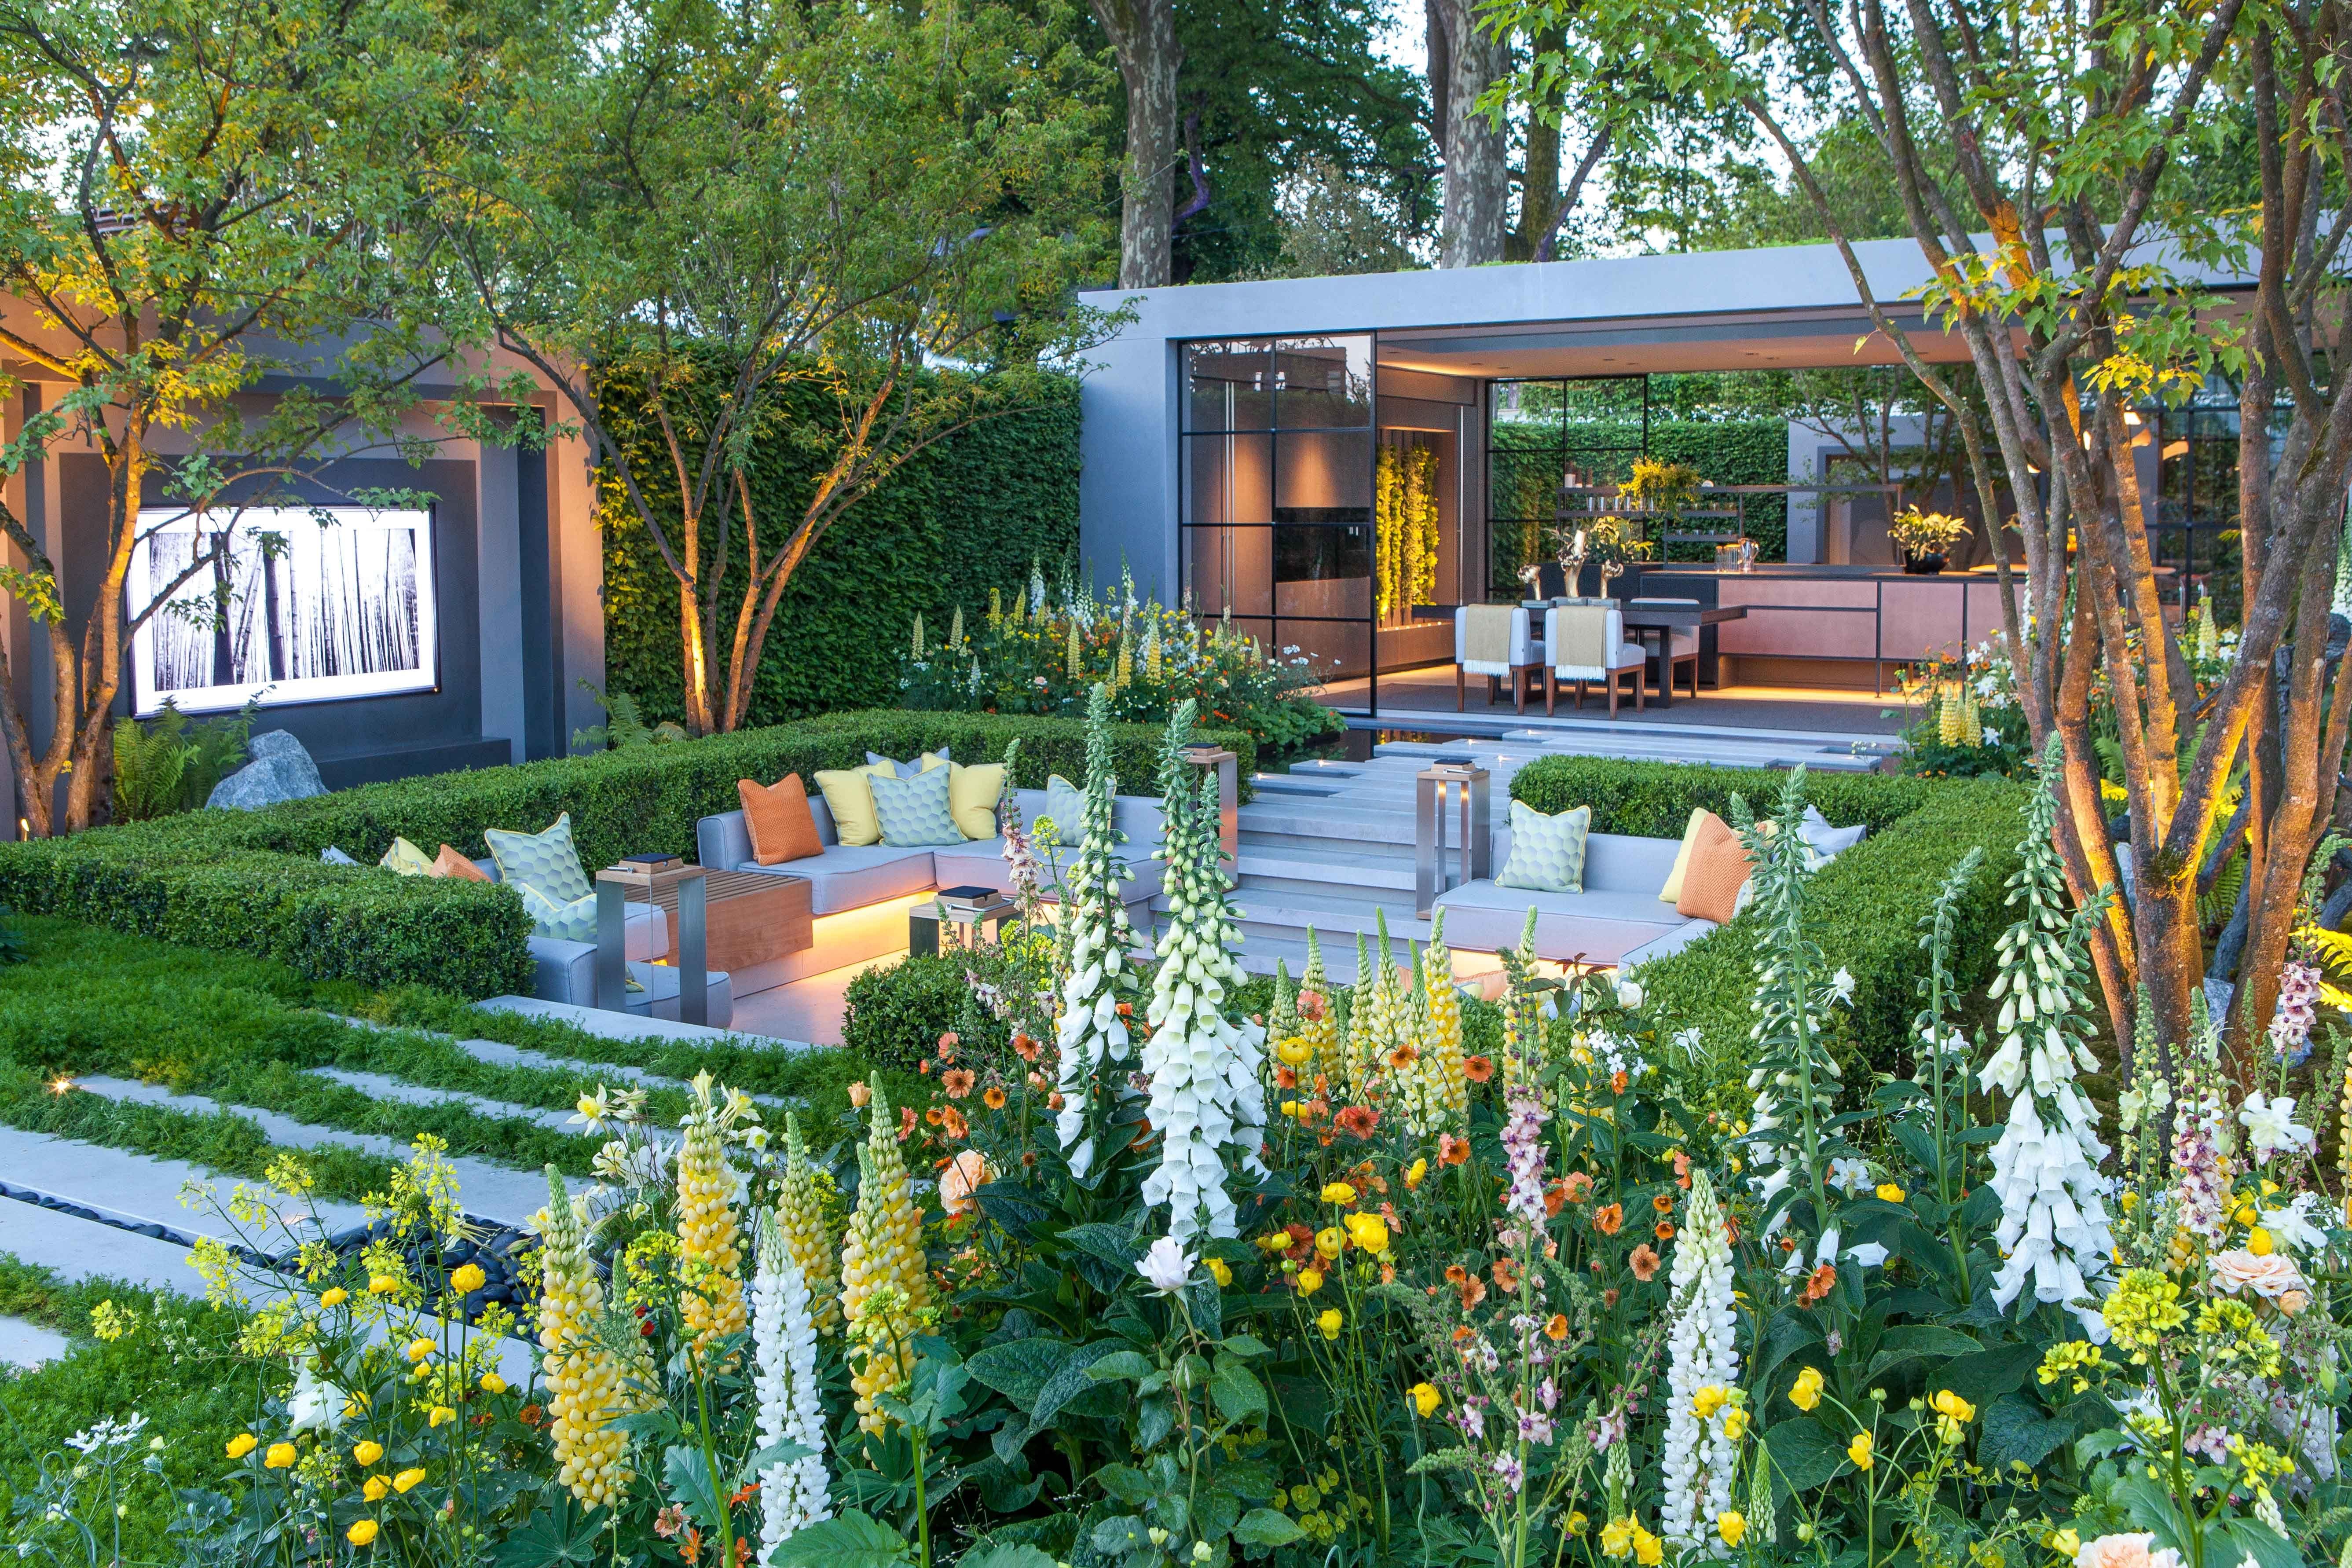 Great LG Eco City Garden   Chelsea Flower Show 2018